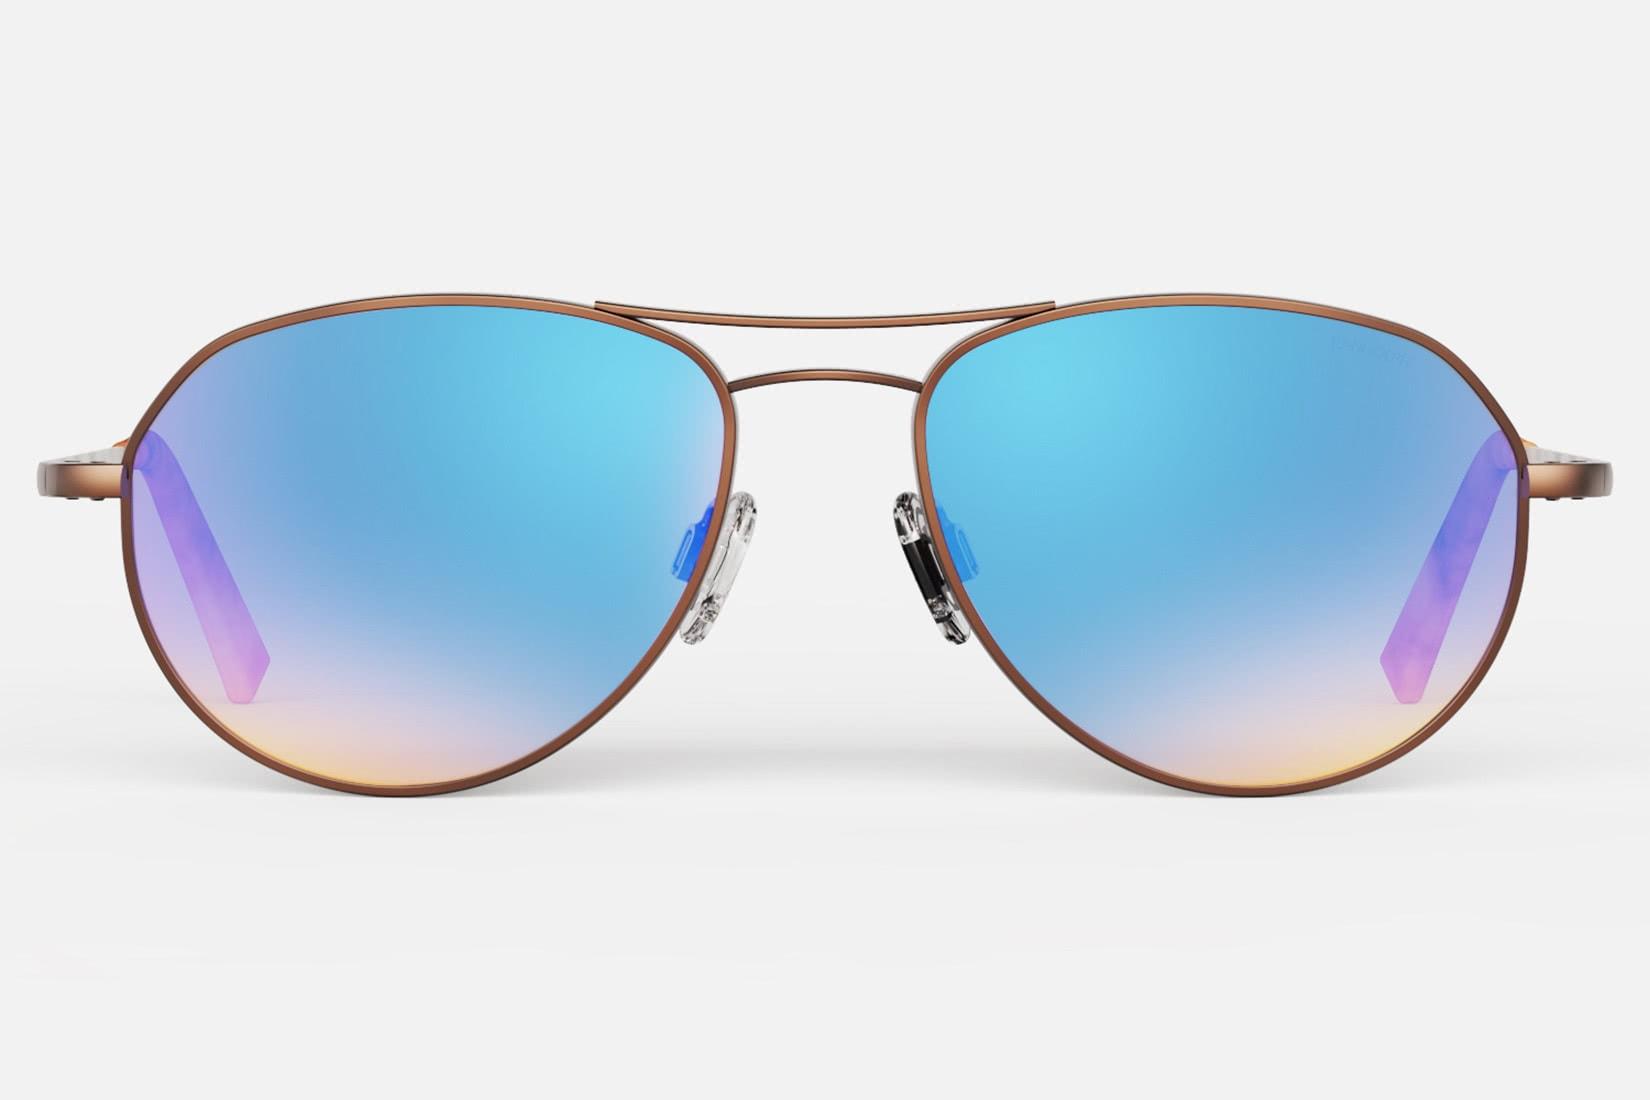 Randolph USA thaden women sunglasses review - Luxe Digital